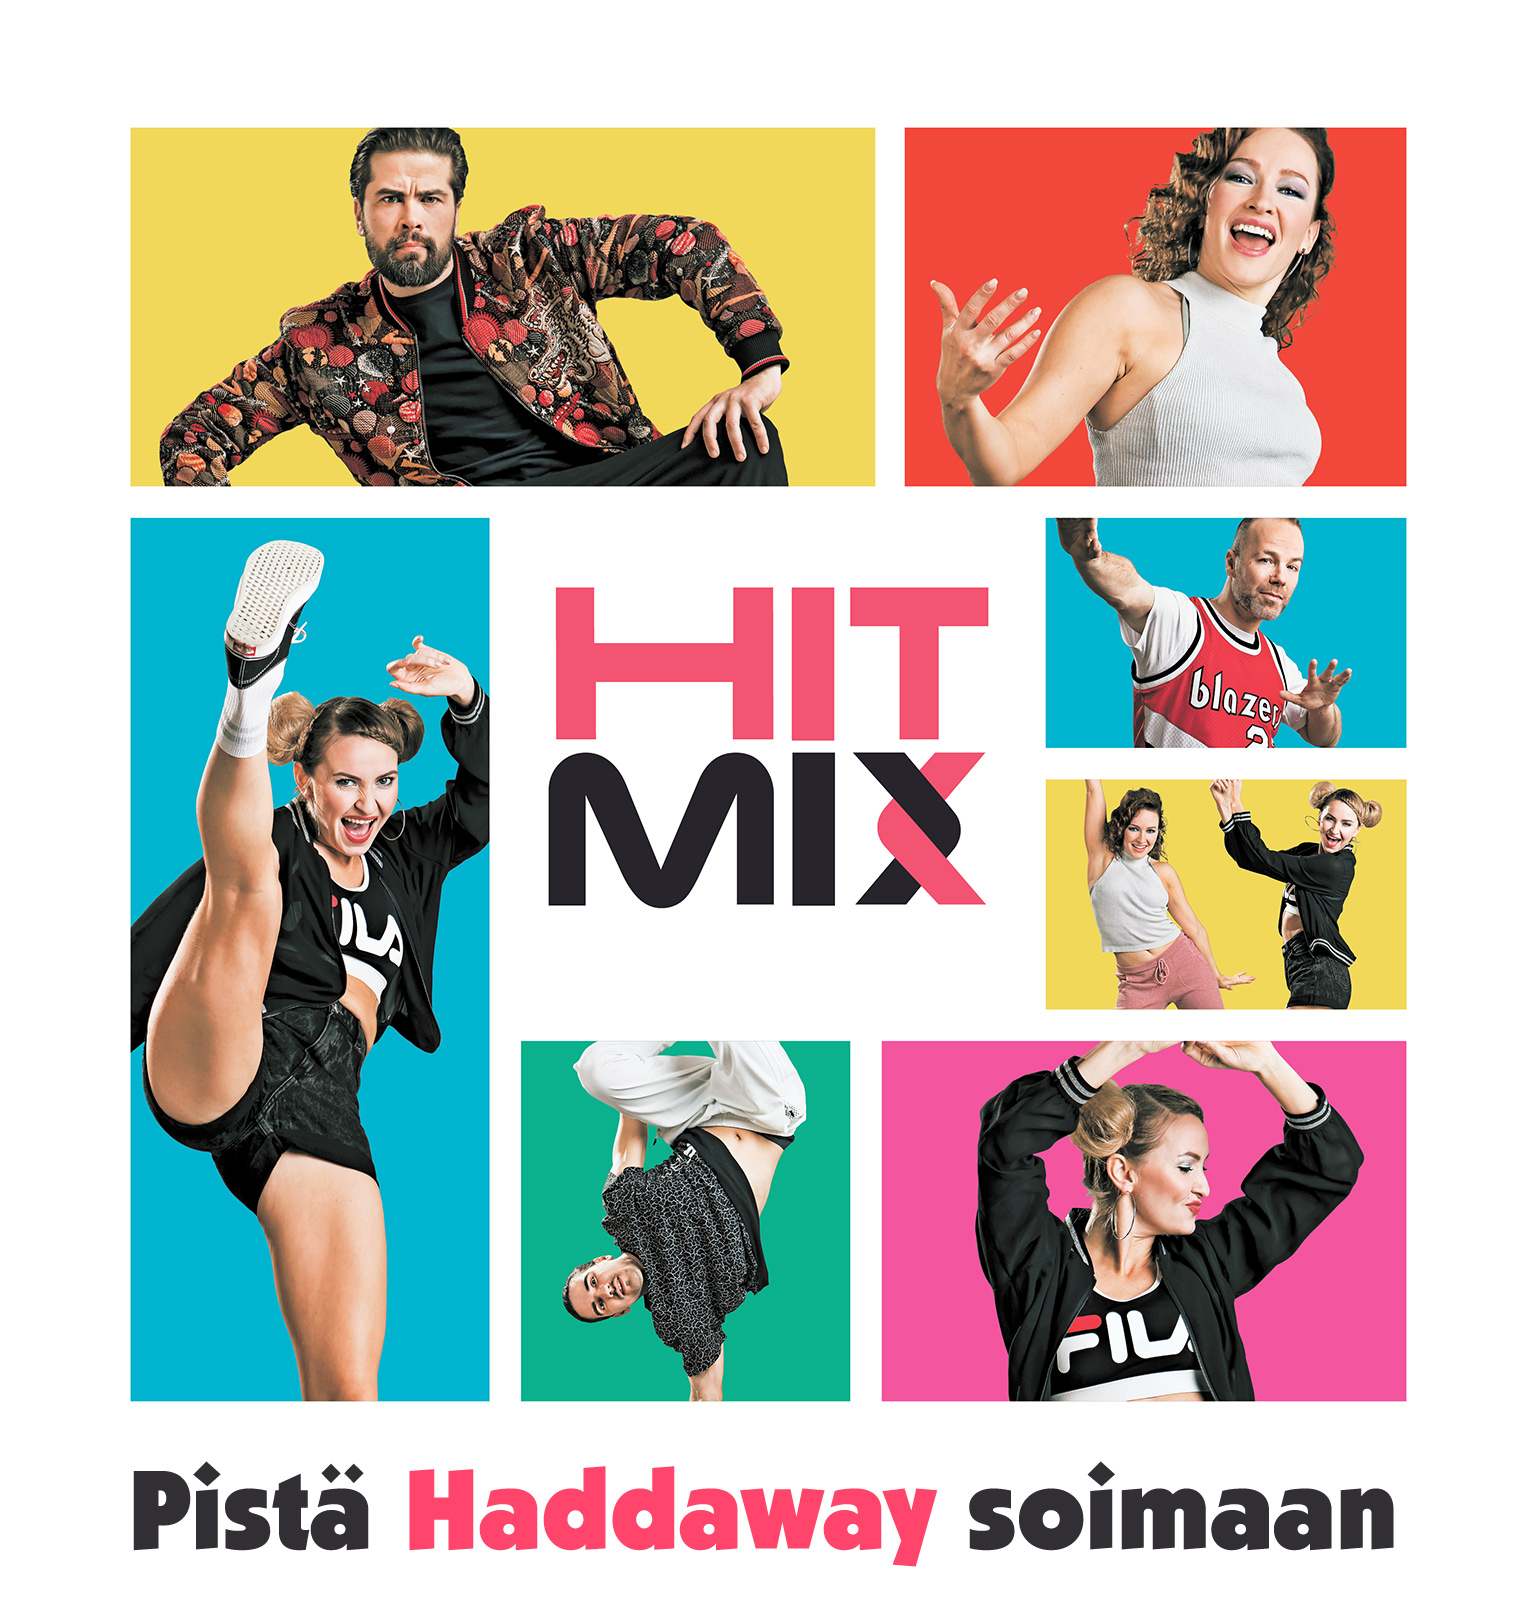 HitMix_pistä-haddaway.jpg